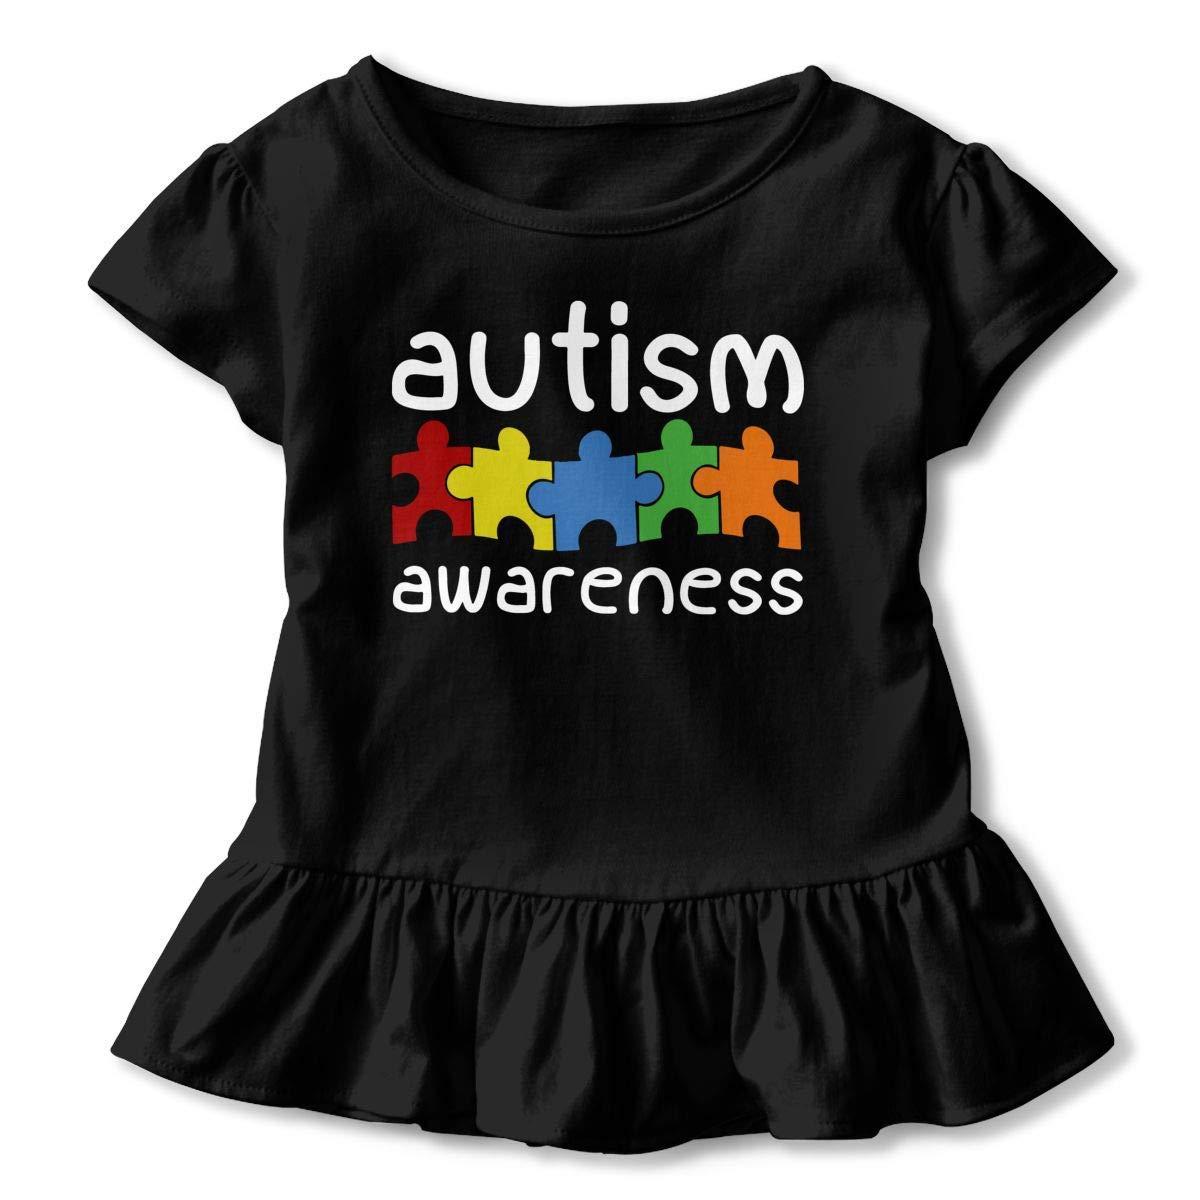 PMsunglasses Short-Sleeve Autism Awareness Shirts for Kids 2-6T Cute Tunic Shirt Dress with Falbala